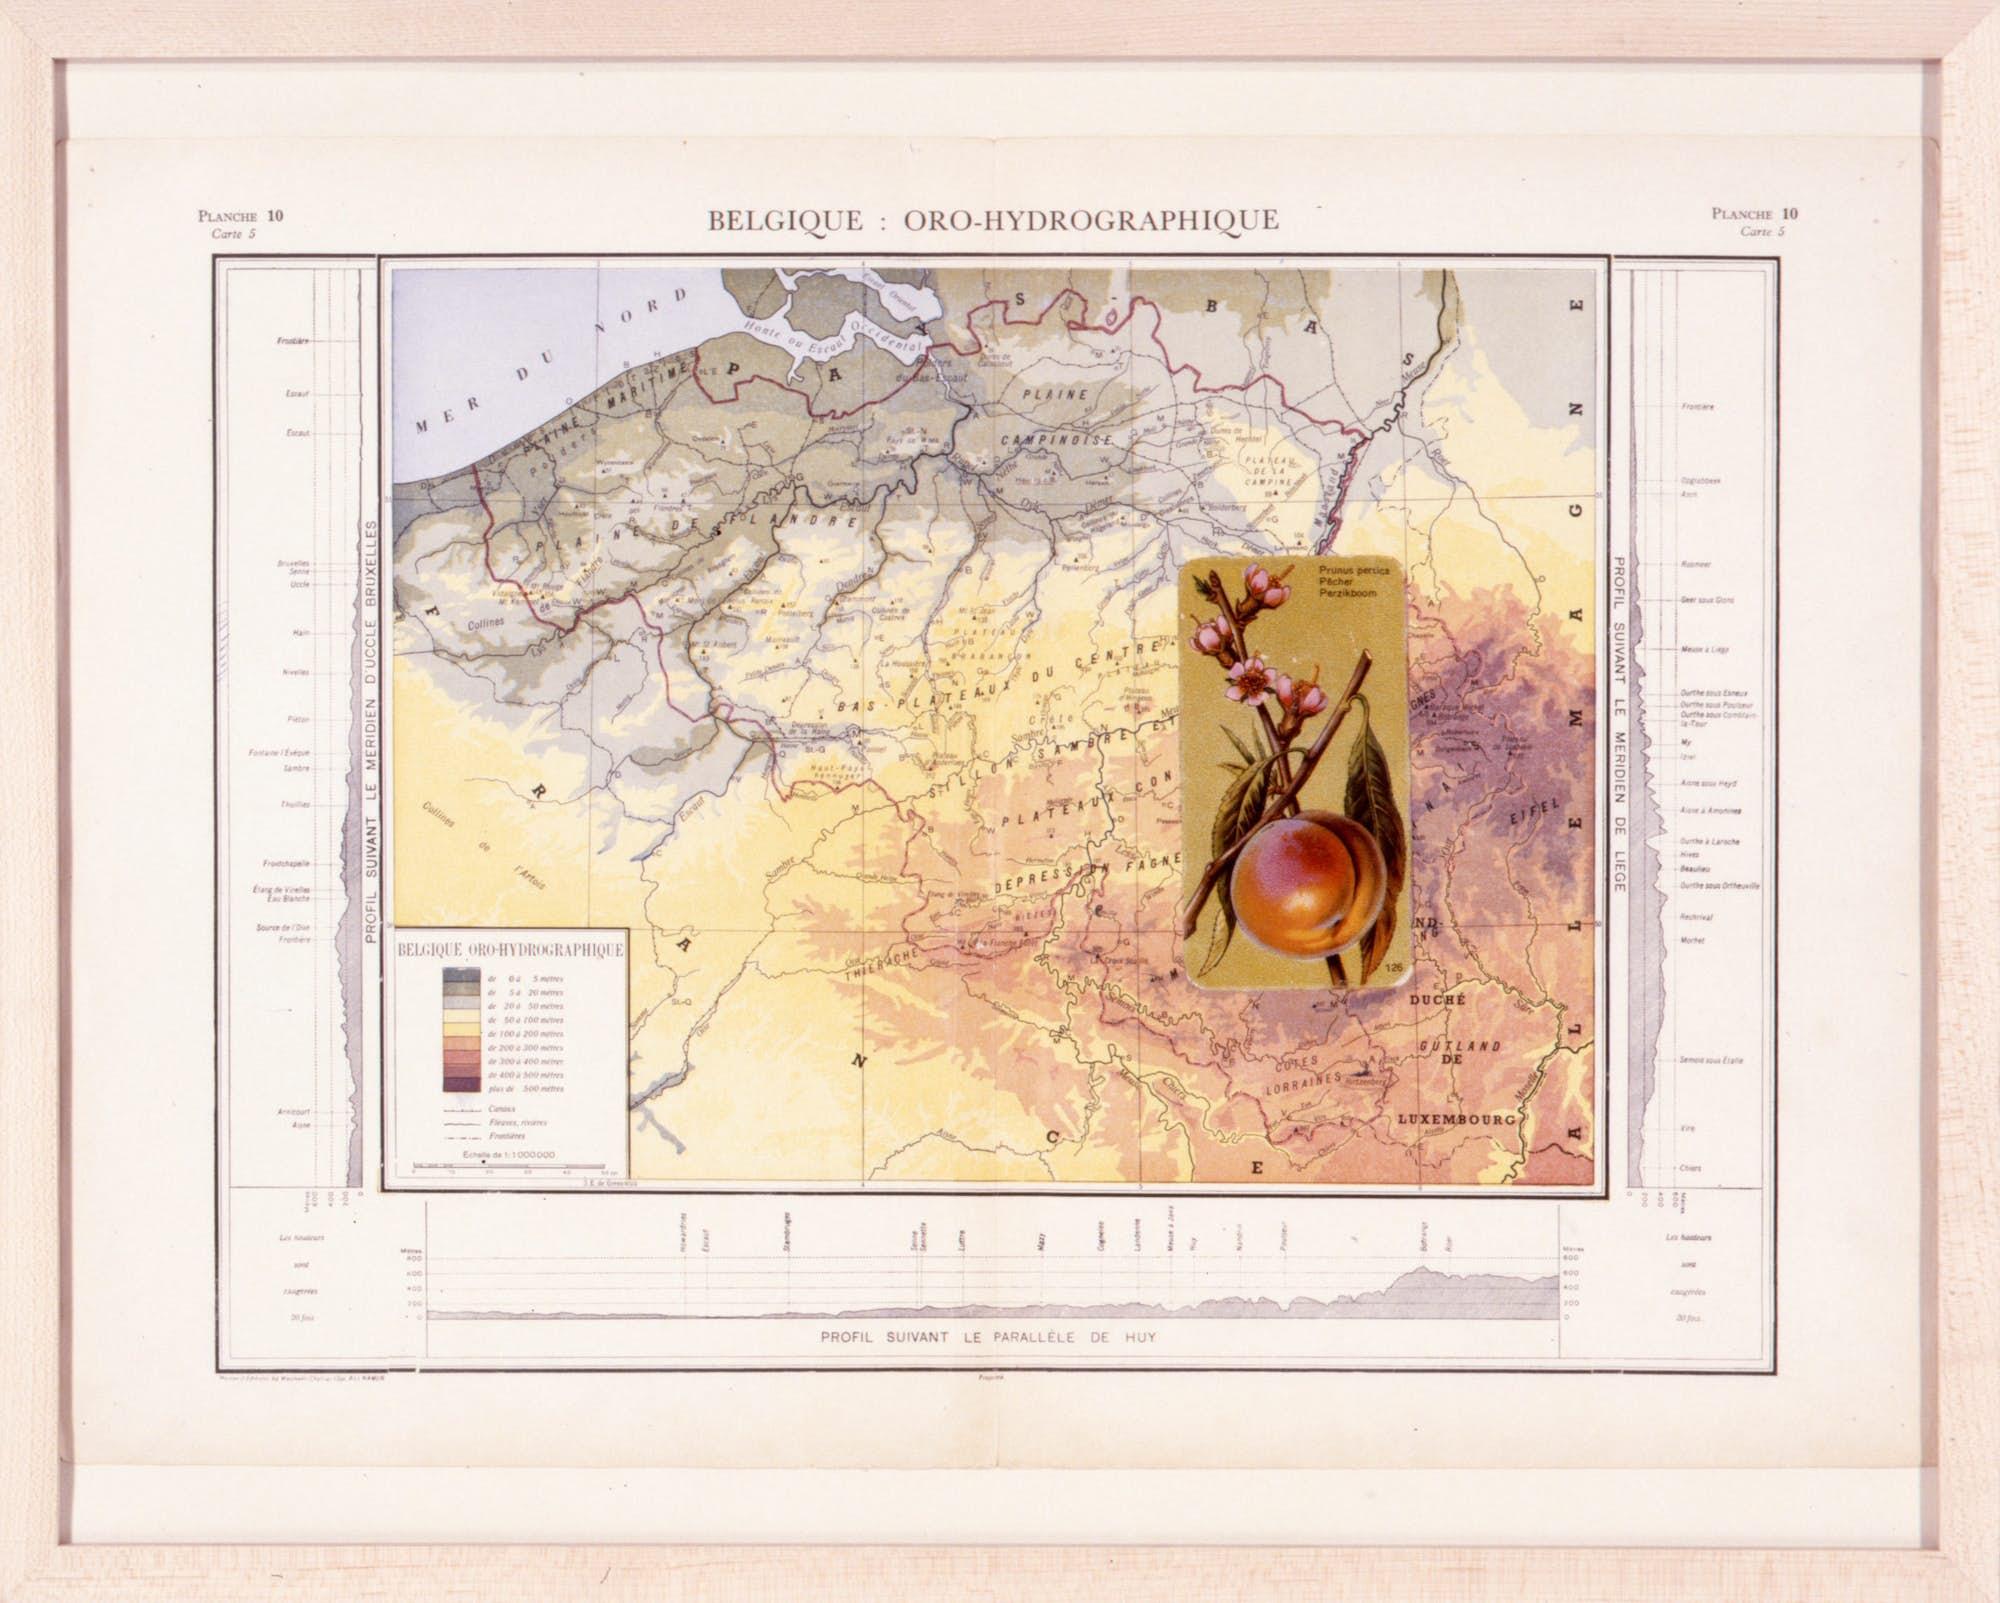 Thierry TILLIER Atlas Botanica 2